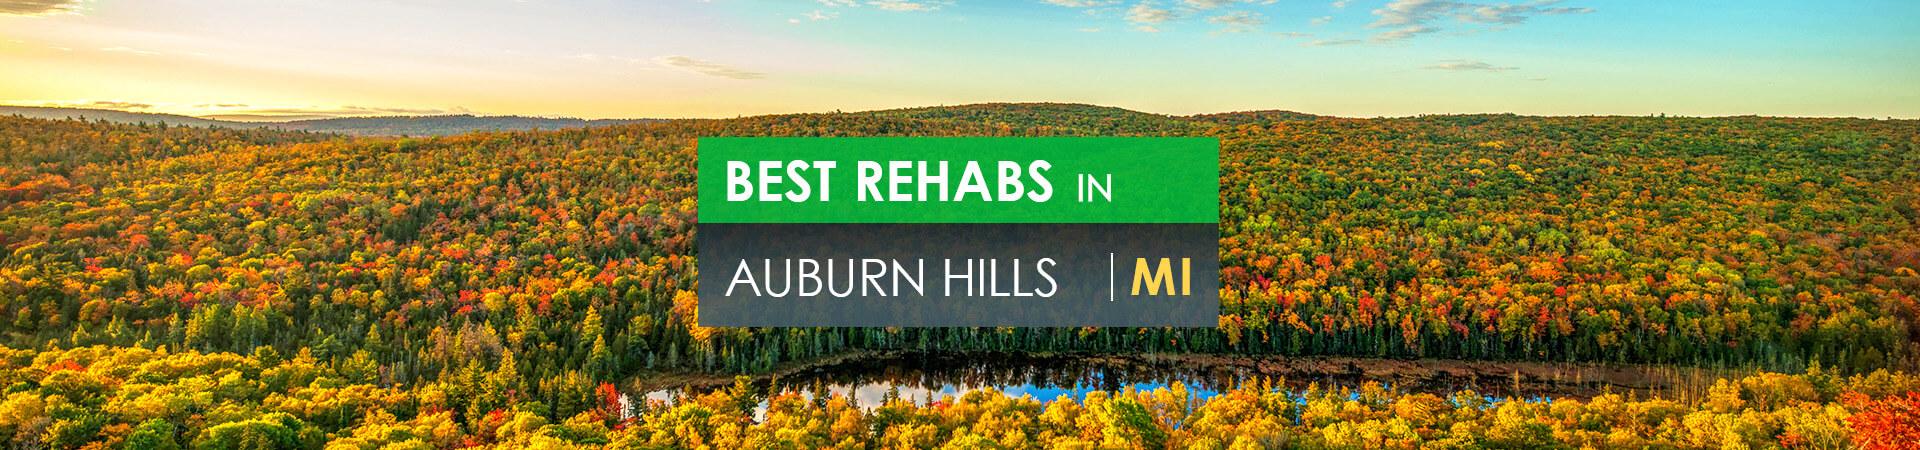 Best rehabs in Auburn Hills, MI